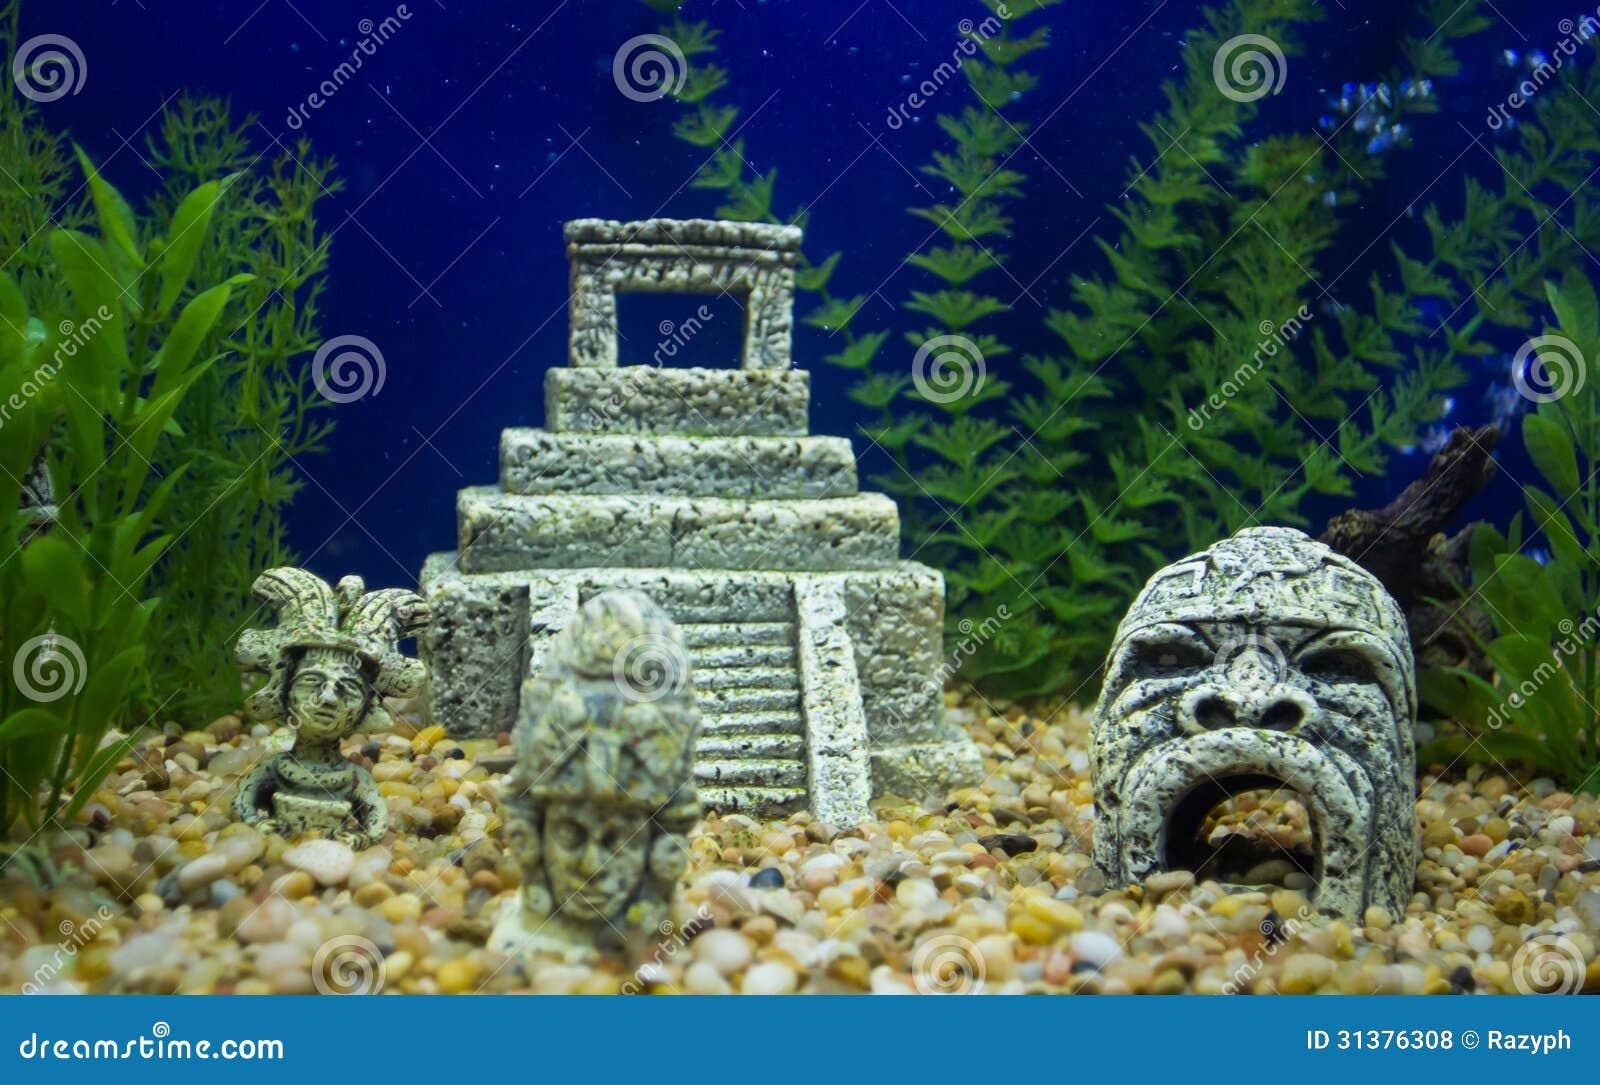 Aquarium fish tank download - Maya Vestiges In Fish Tank